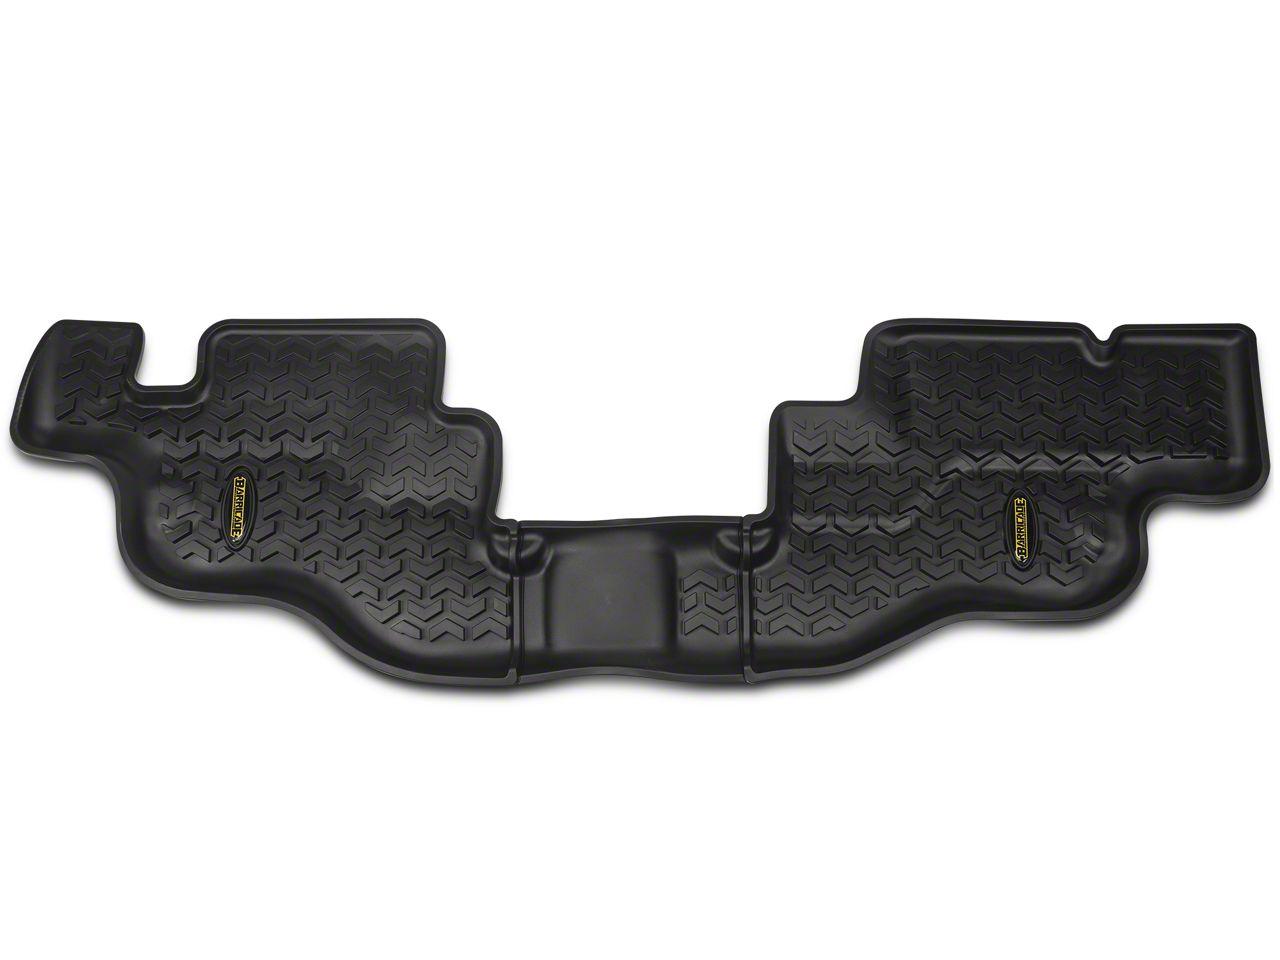 Barricade All Terrain Rear Floor Mat - Black (87-95 Jeep Wrangler YJ)